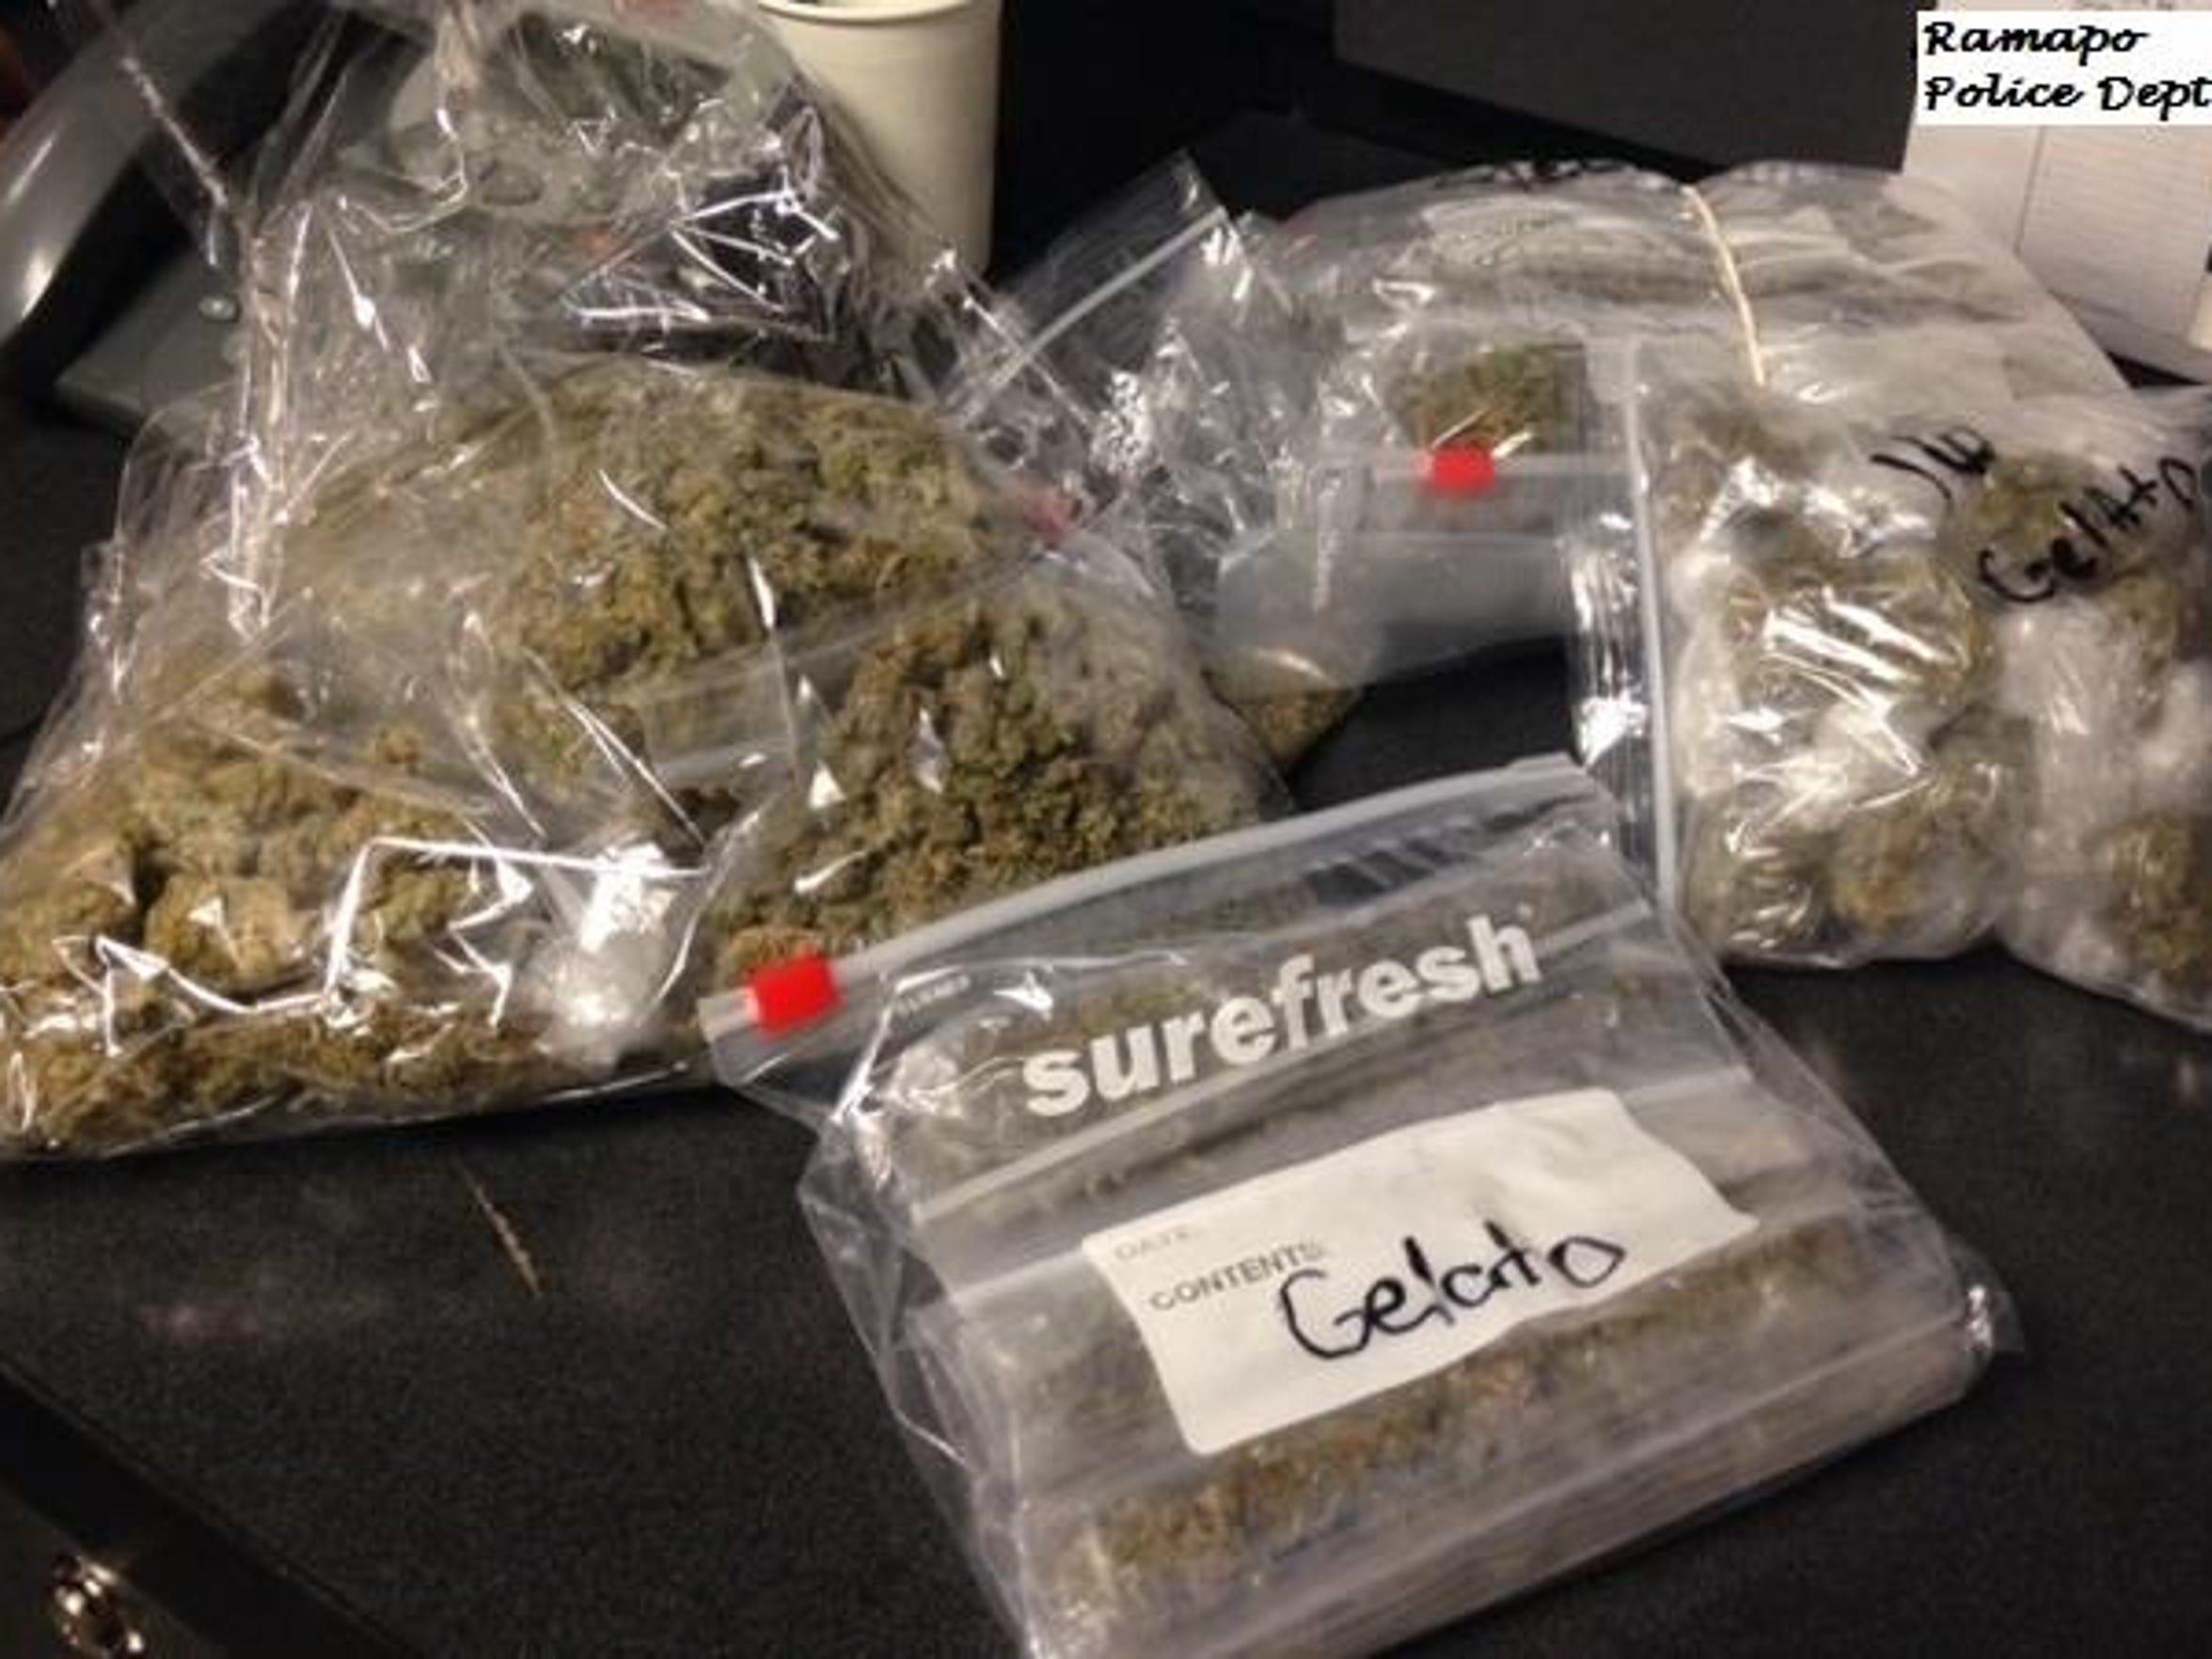 Ramapo police seized 2 pounds of marijuana after a